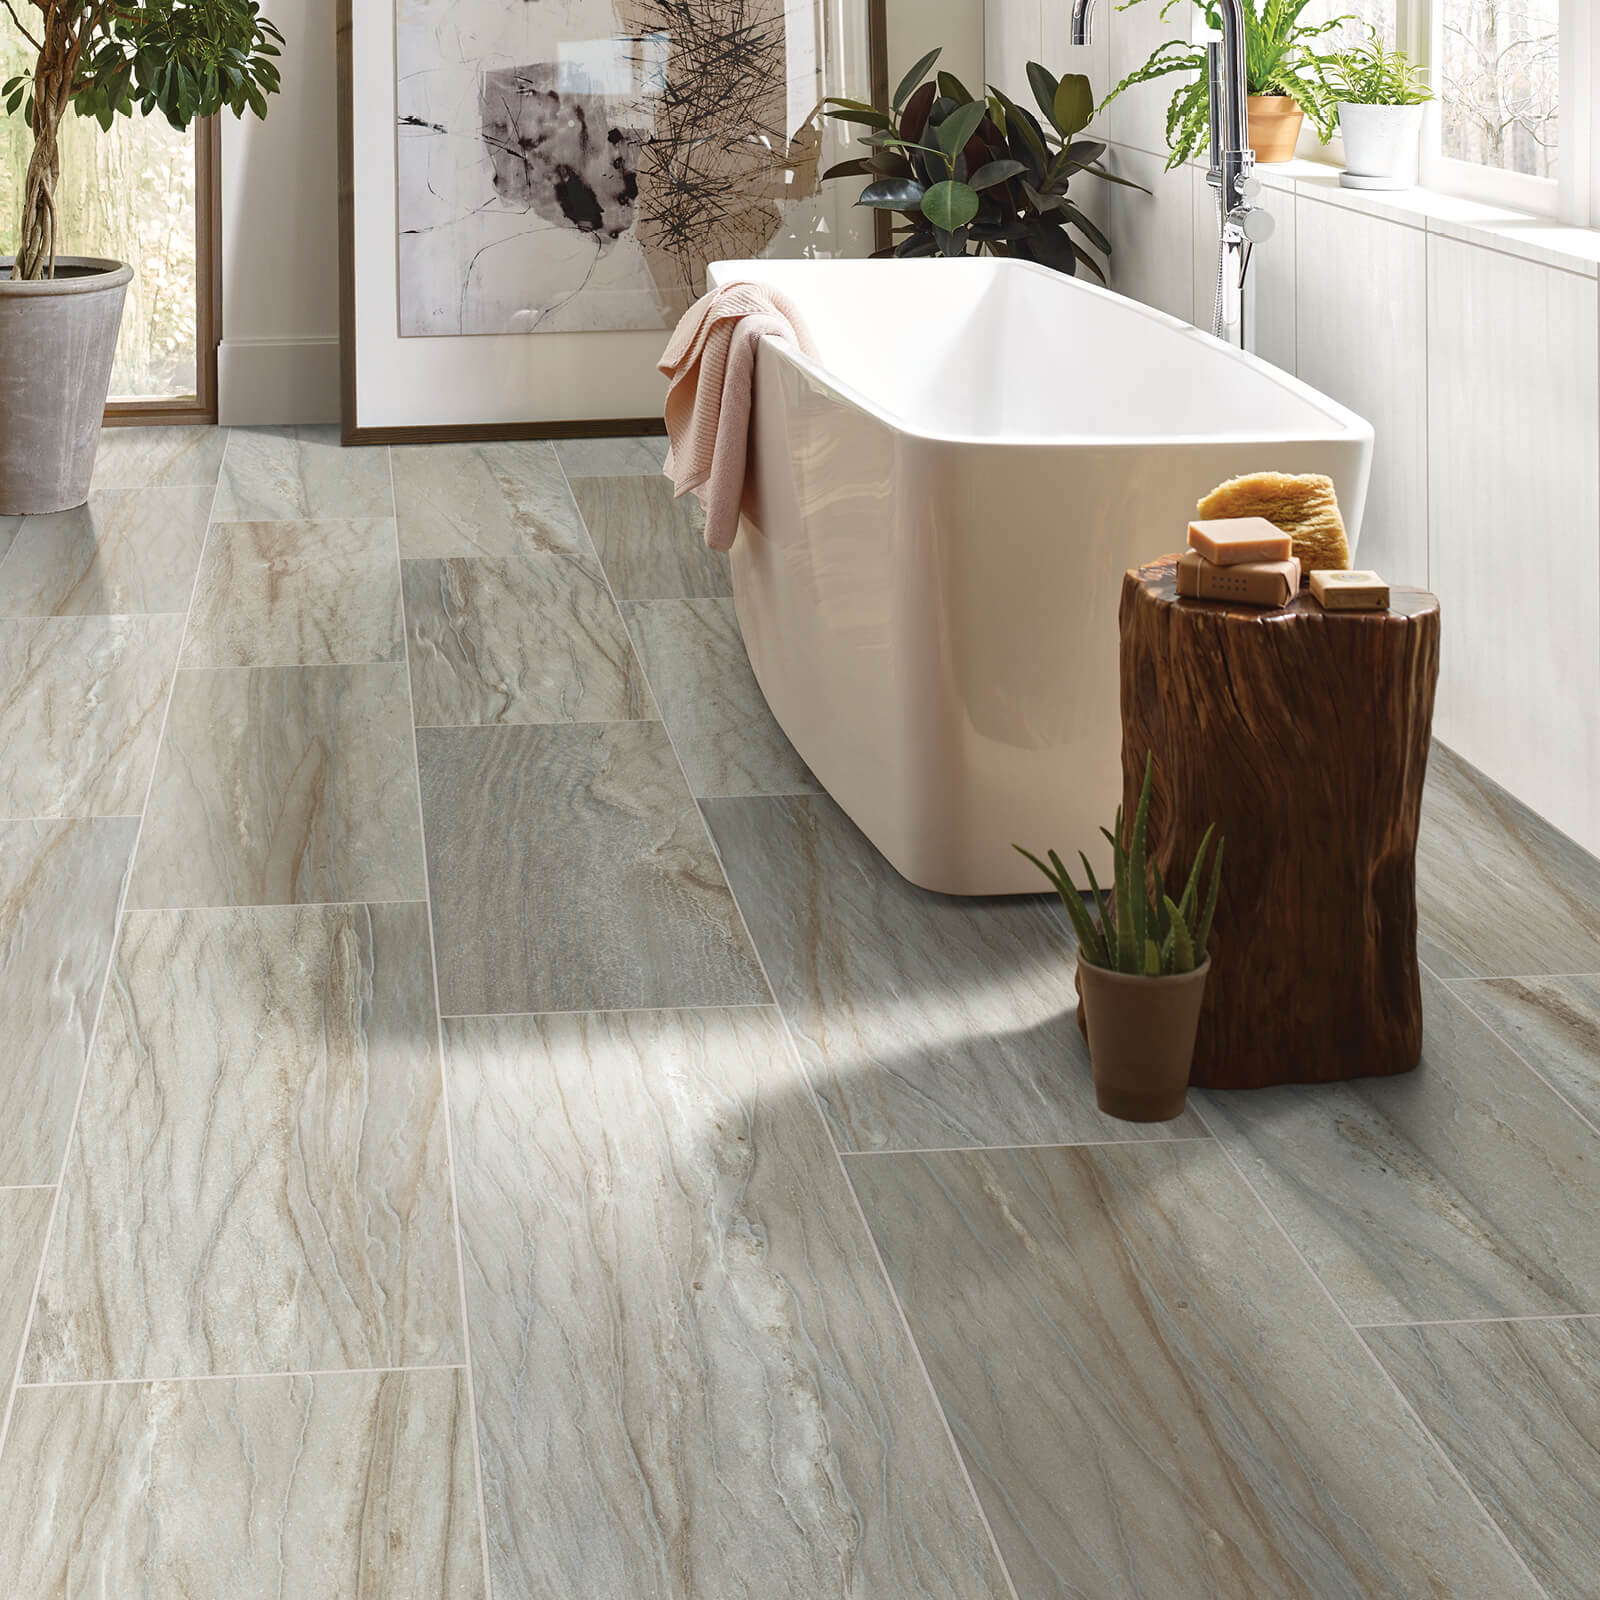 Sanctuary bathroom tile | Bram Flooring